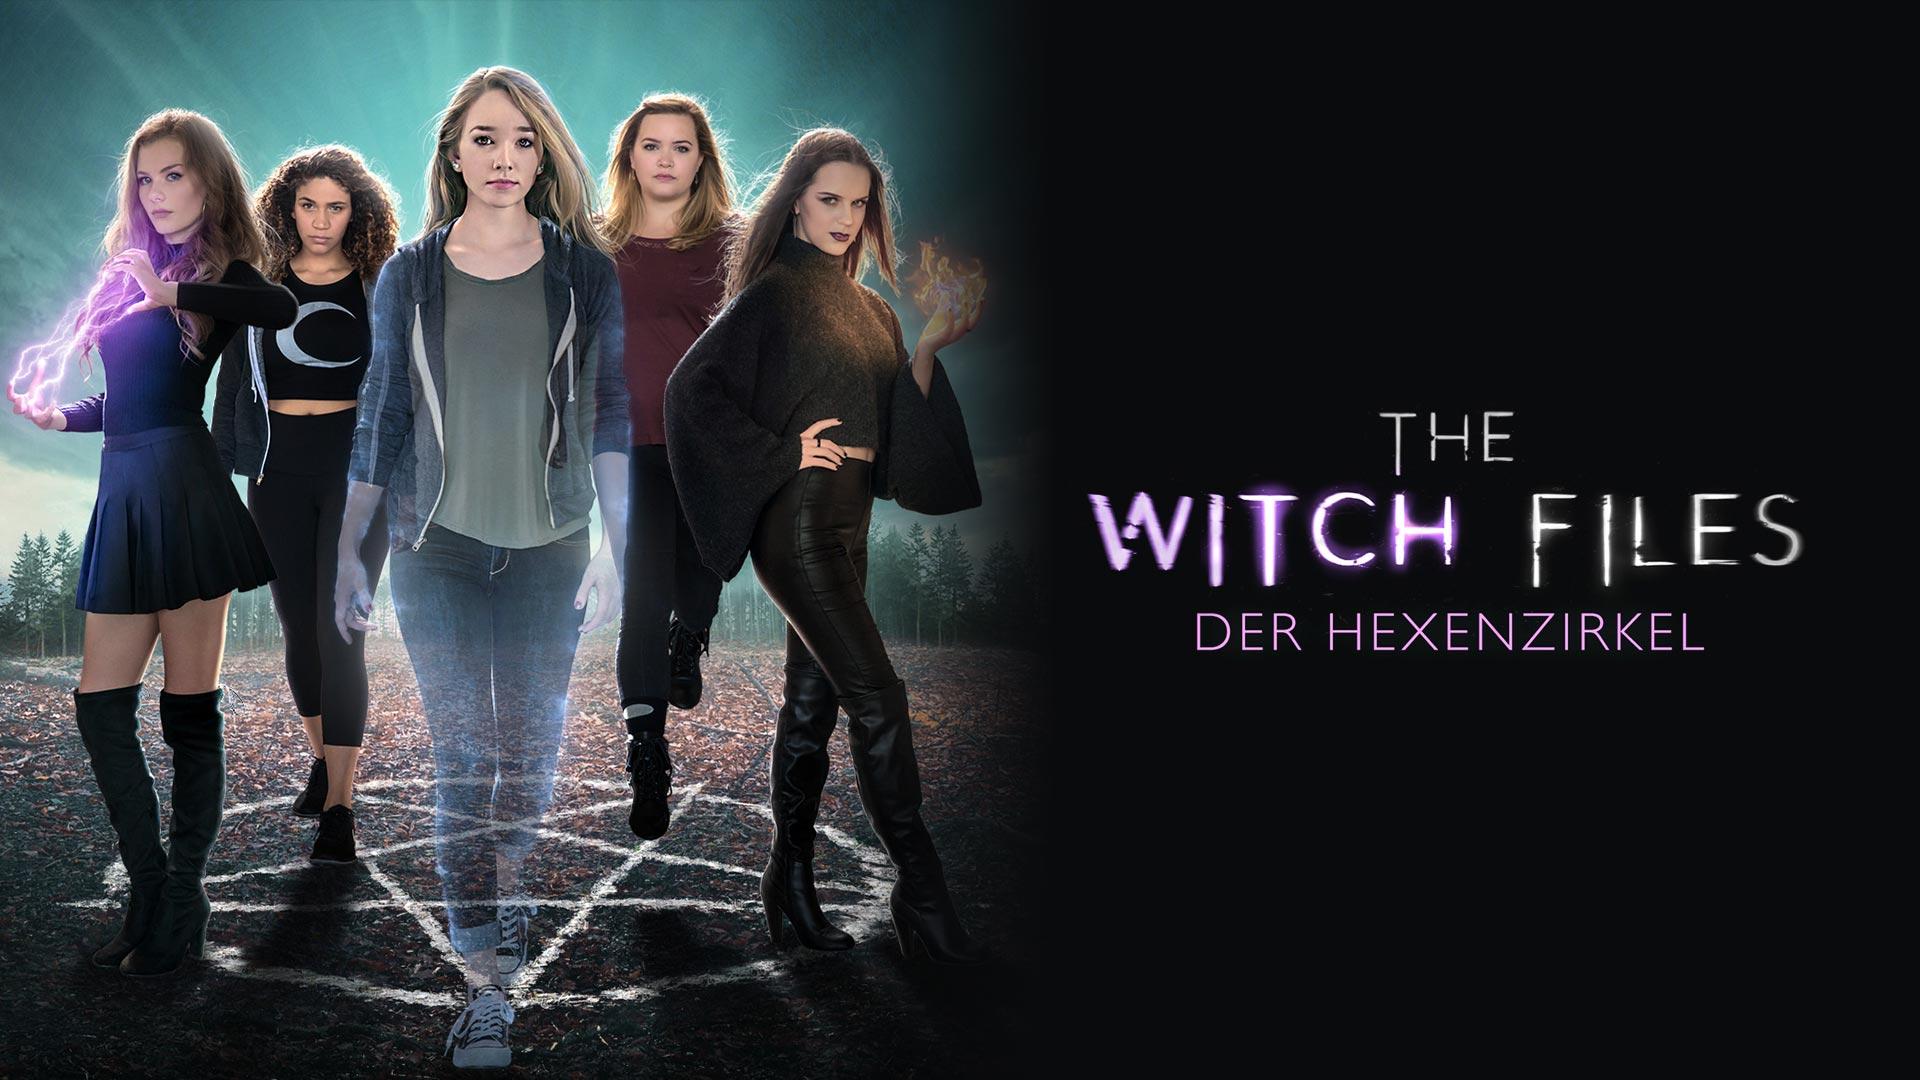 The Witch Files: Der Hexenzirkel